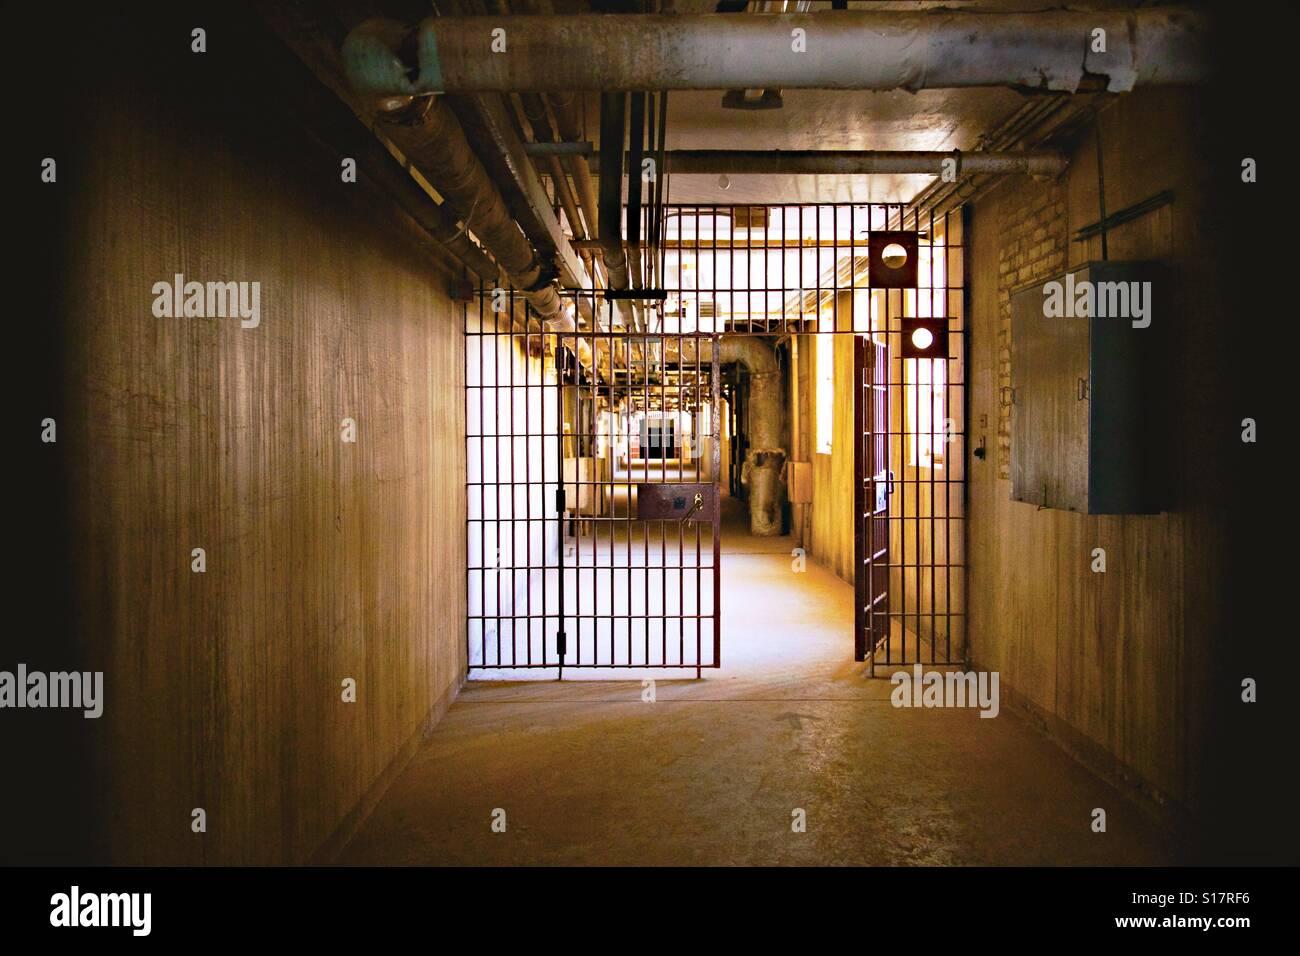 Santa Fe Penitentiary Riot Cellblock - Stock Image